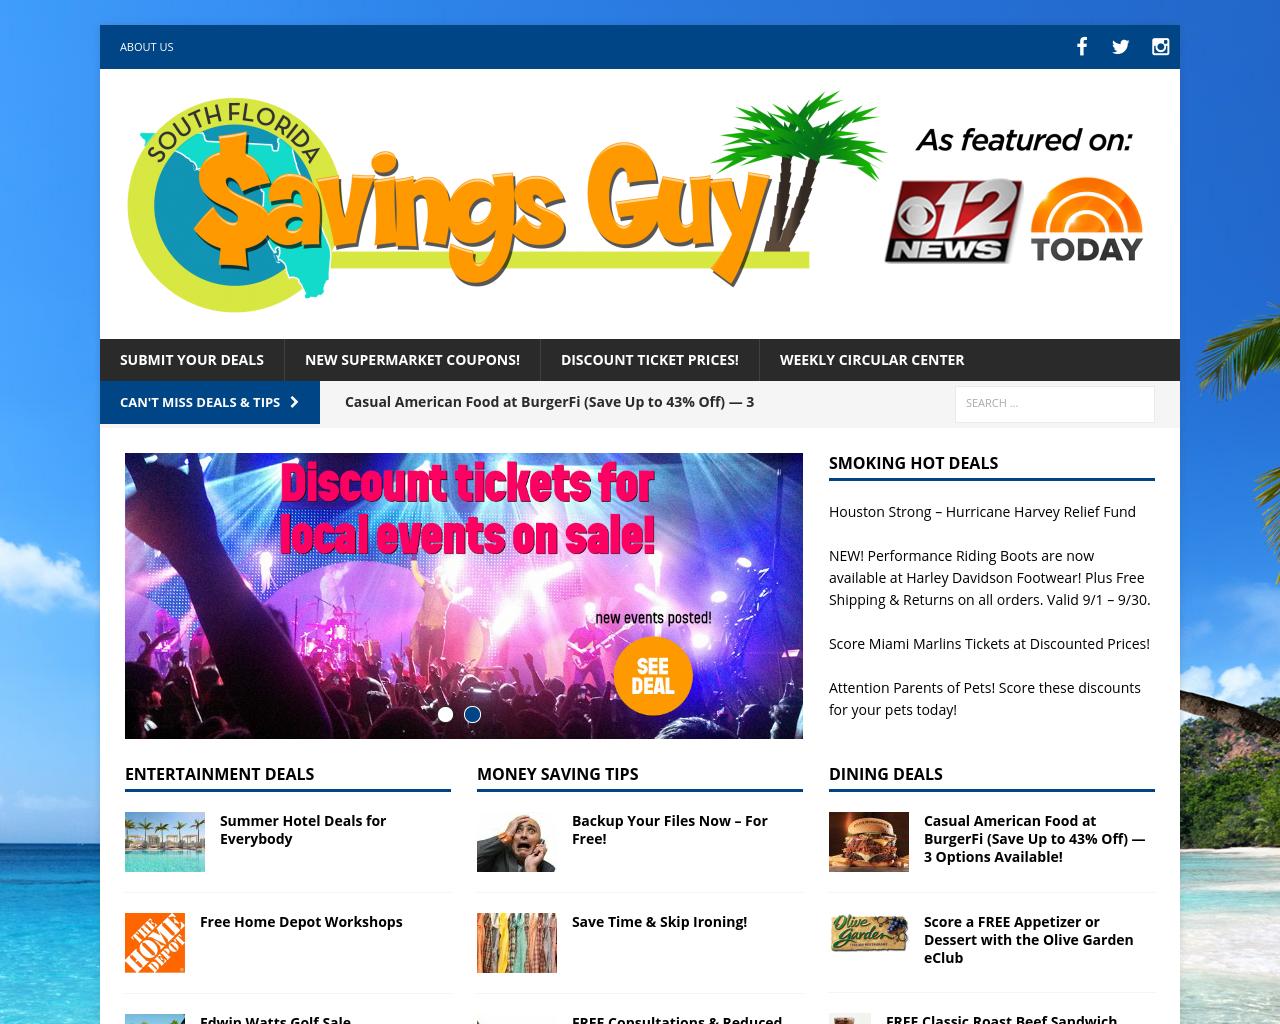 South-Florida-Savings-Guy-Advertising-Reviews-Pricing